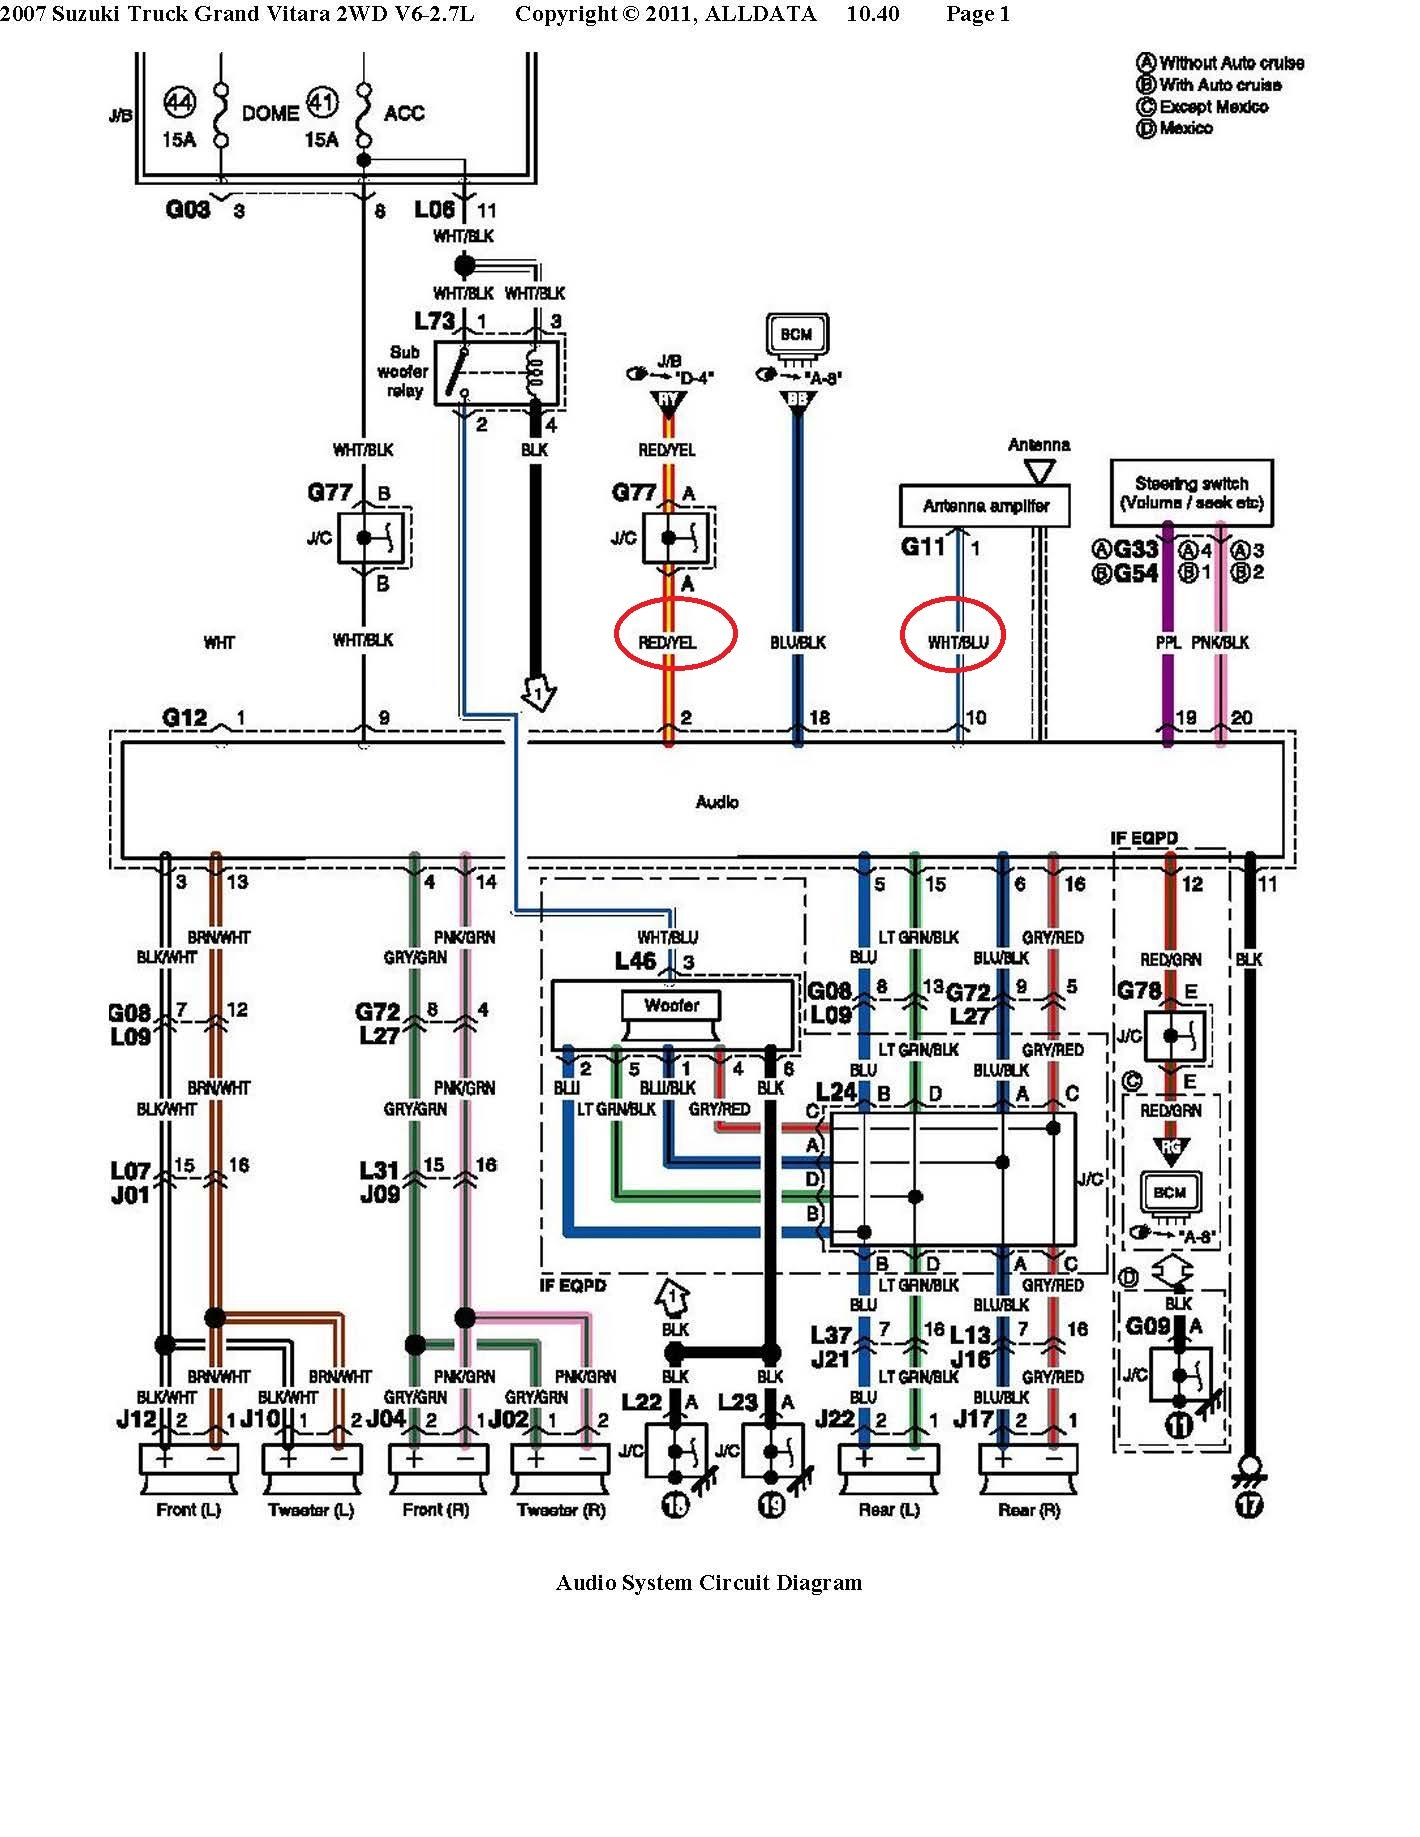 Clarion Stereo Wiring Diagram Suzuki Grand Vitara Data Schema Car Auto Electrical Pioneer Colors